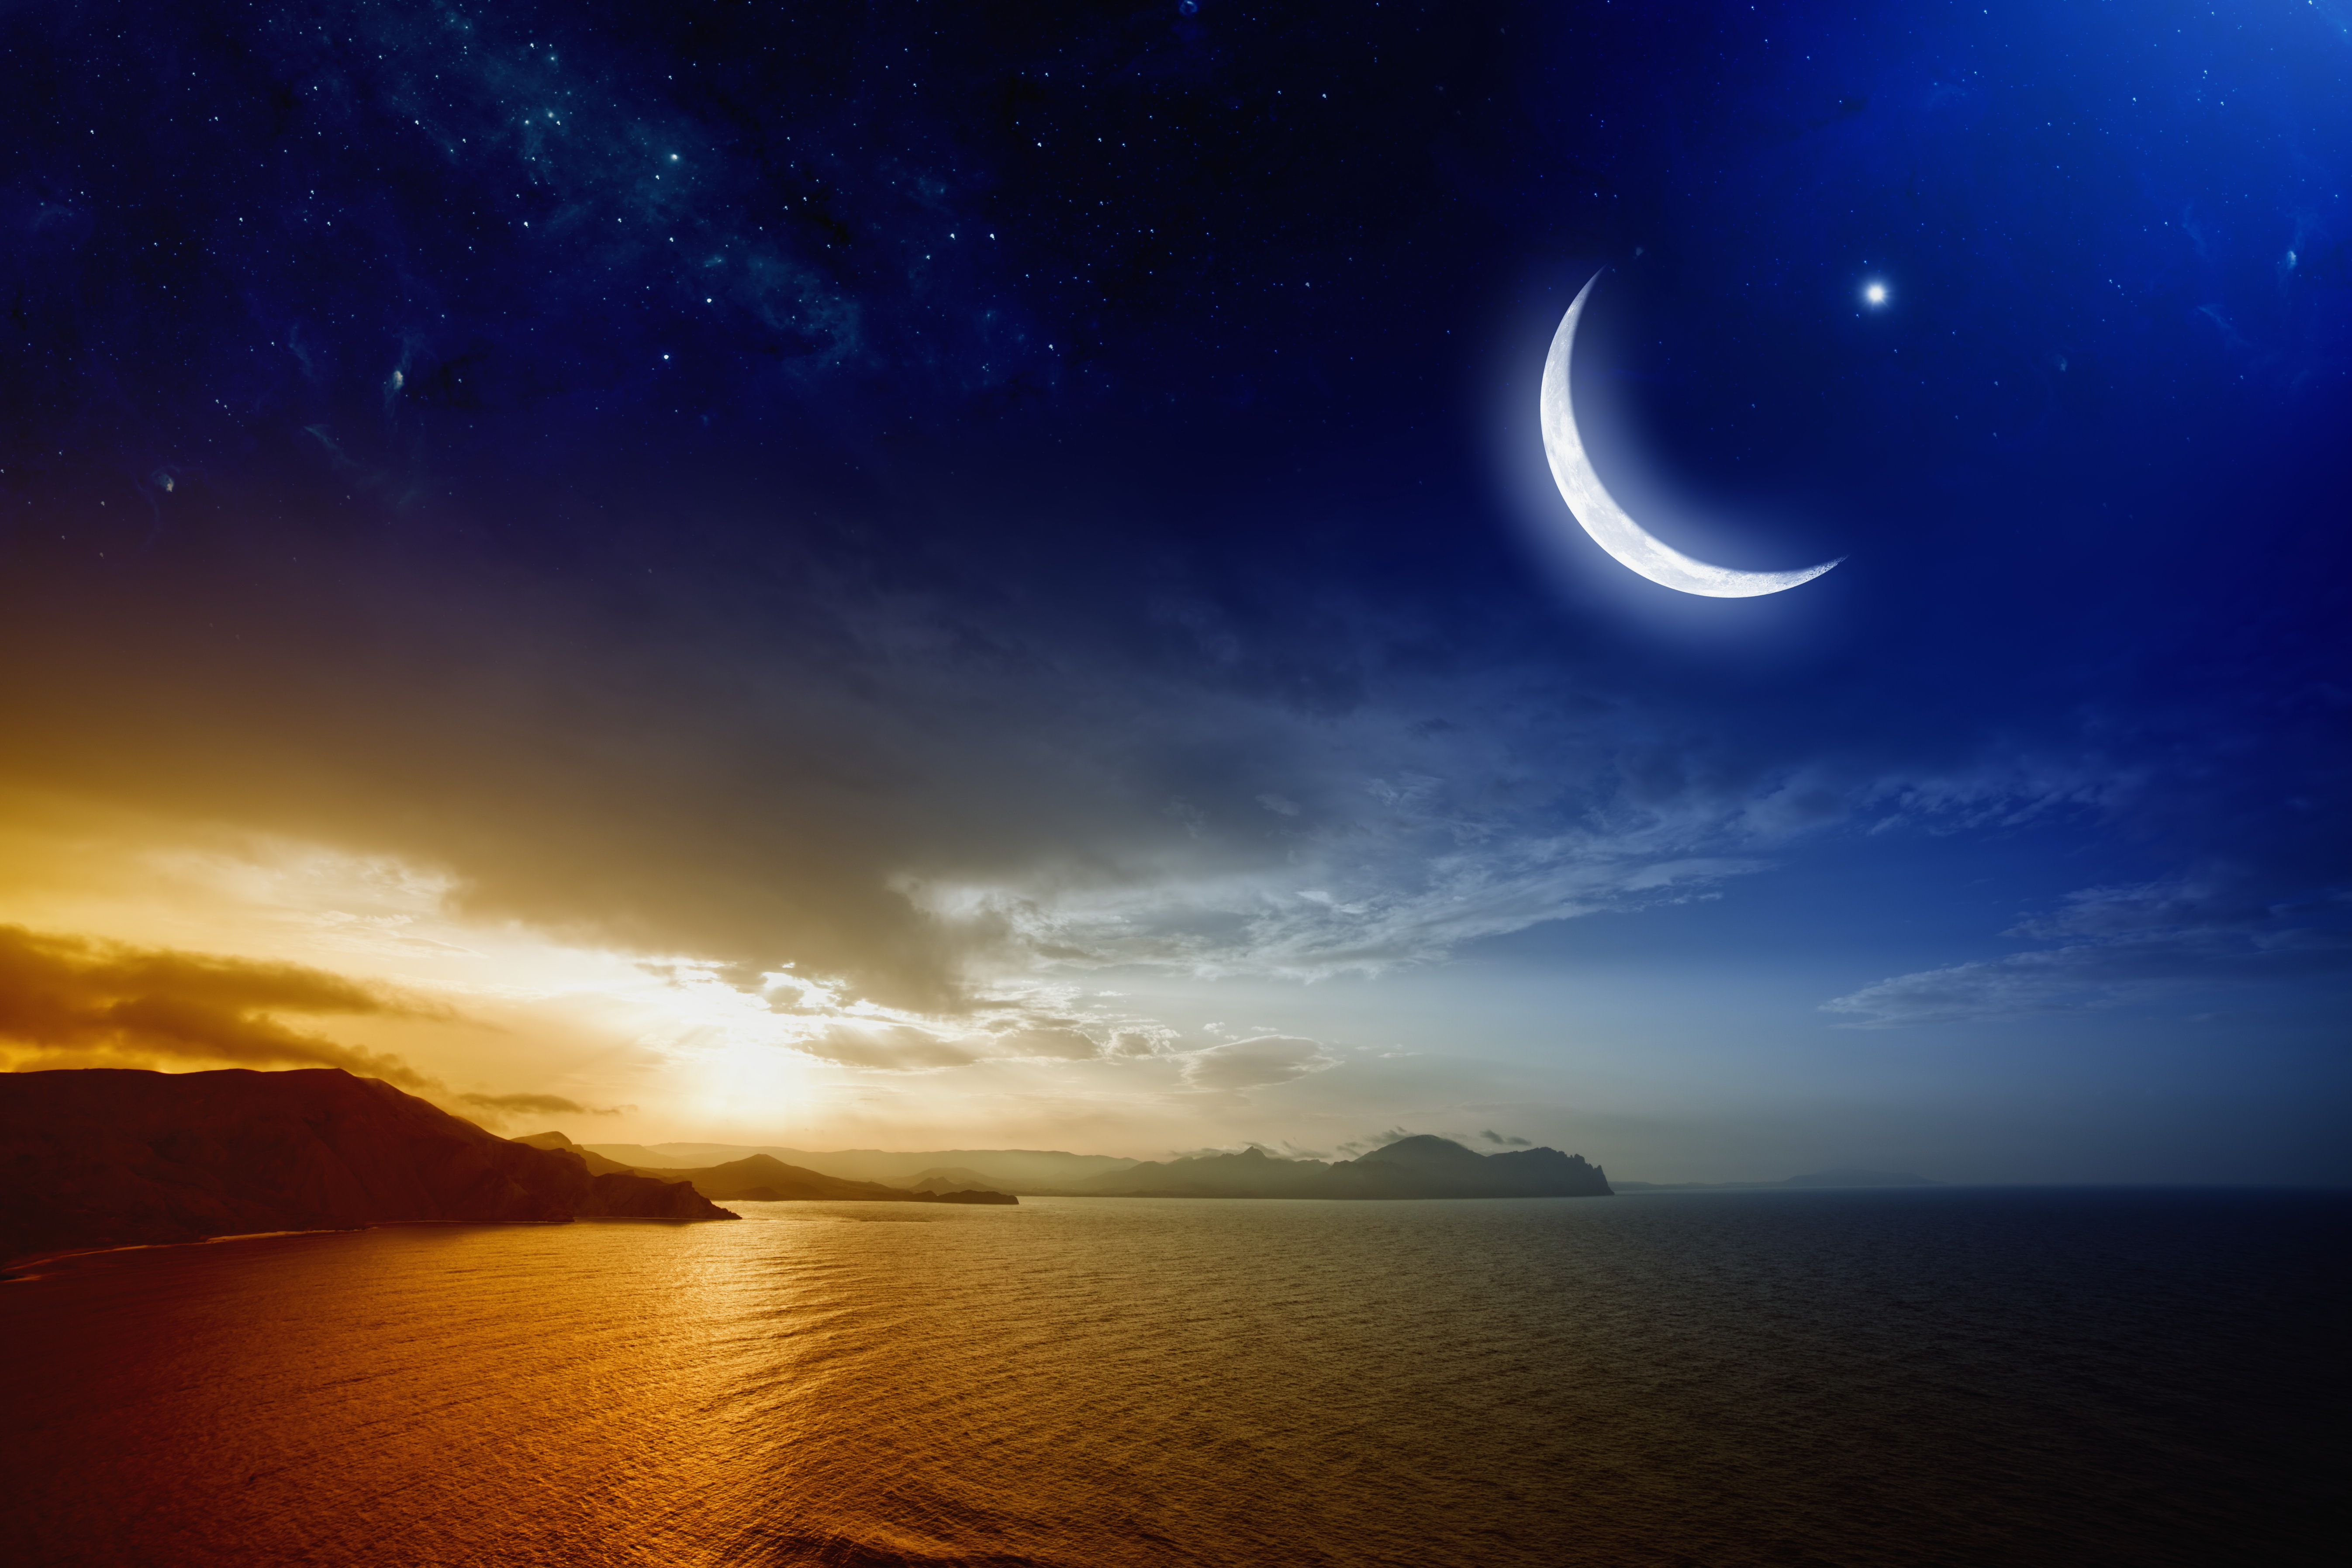 crescent moon iphone 6 wallpaper